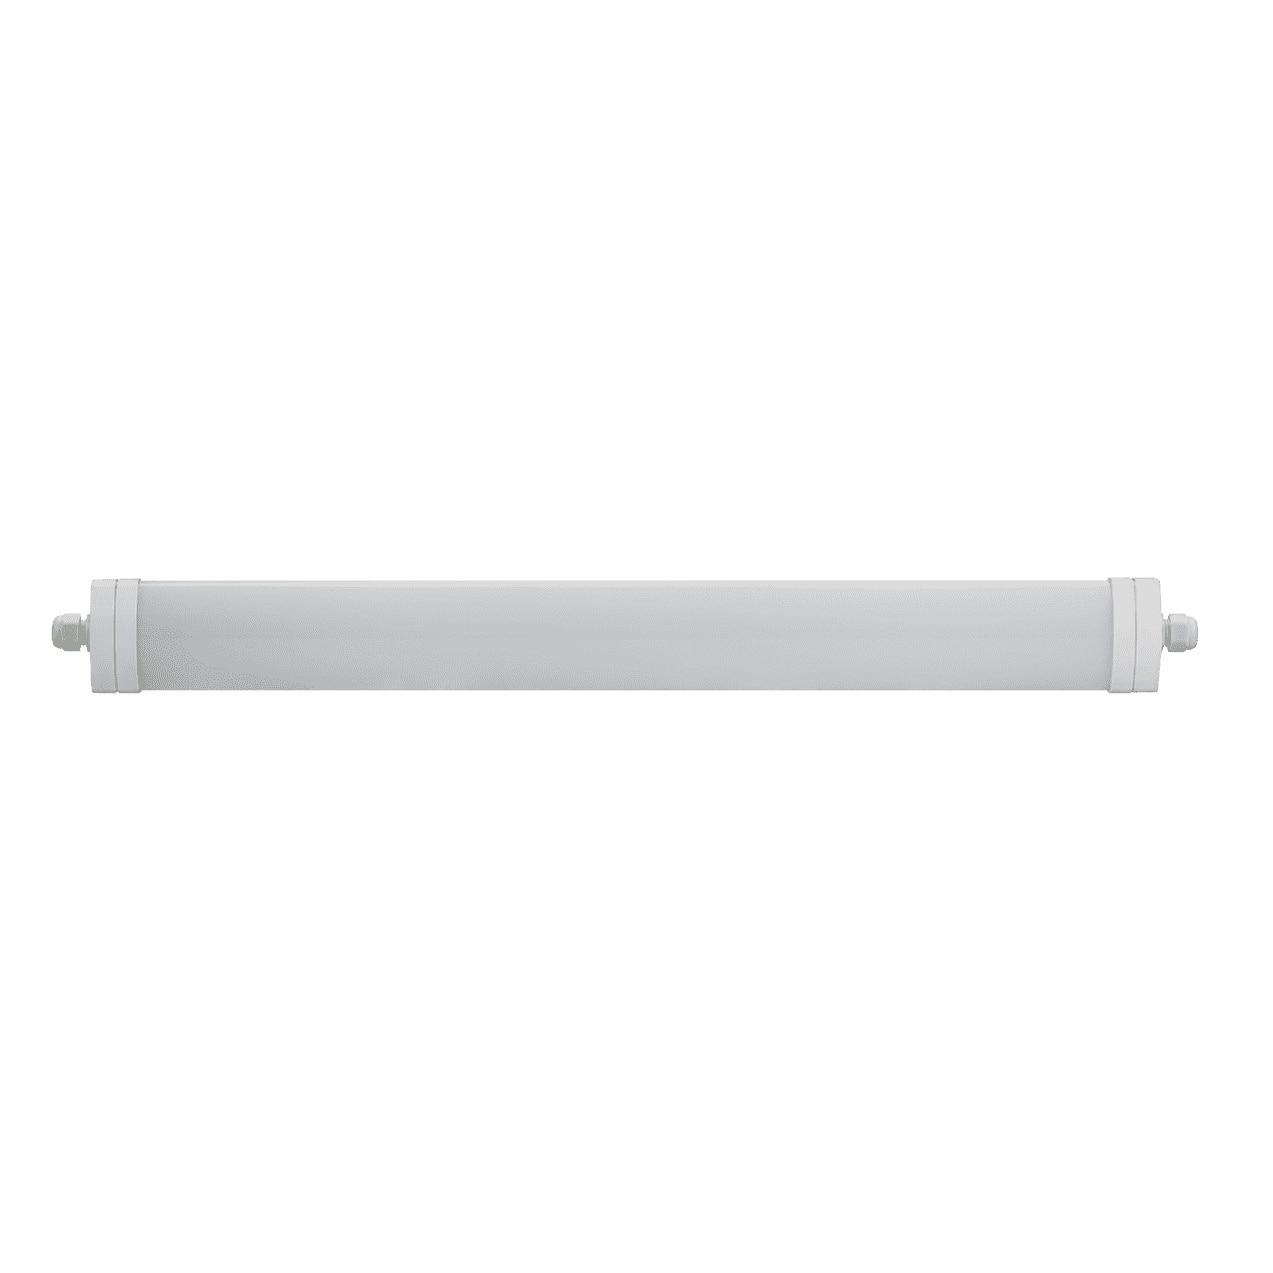 Downlight LED Sealed Spp-158 16w 230v 6500 K 1200lm 550mm IP65 LLT 4690612008615